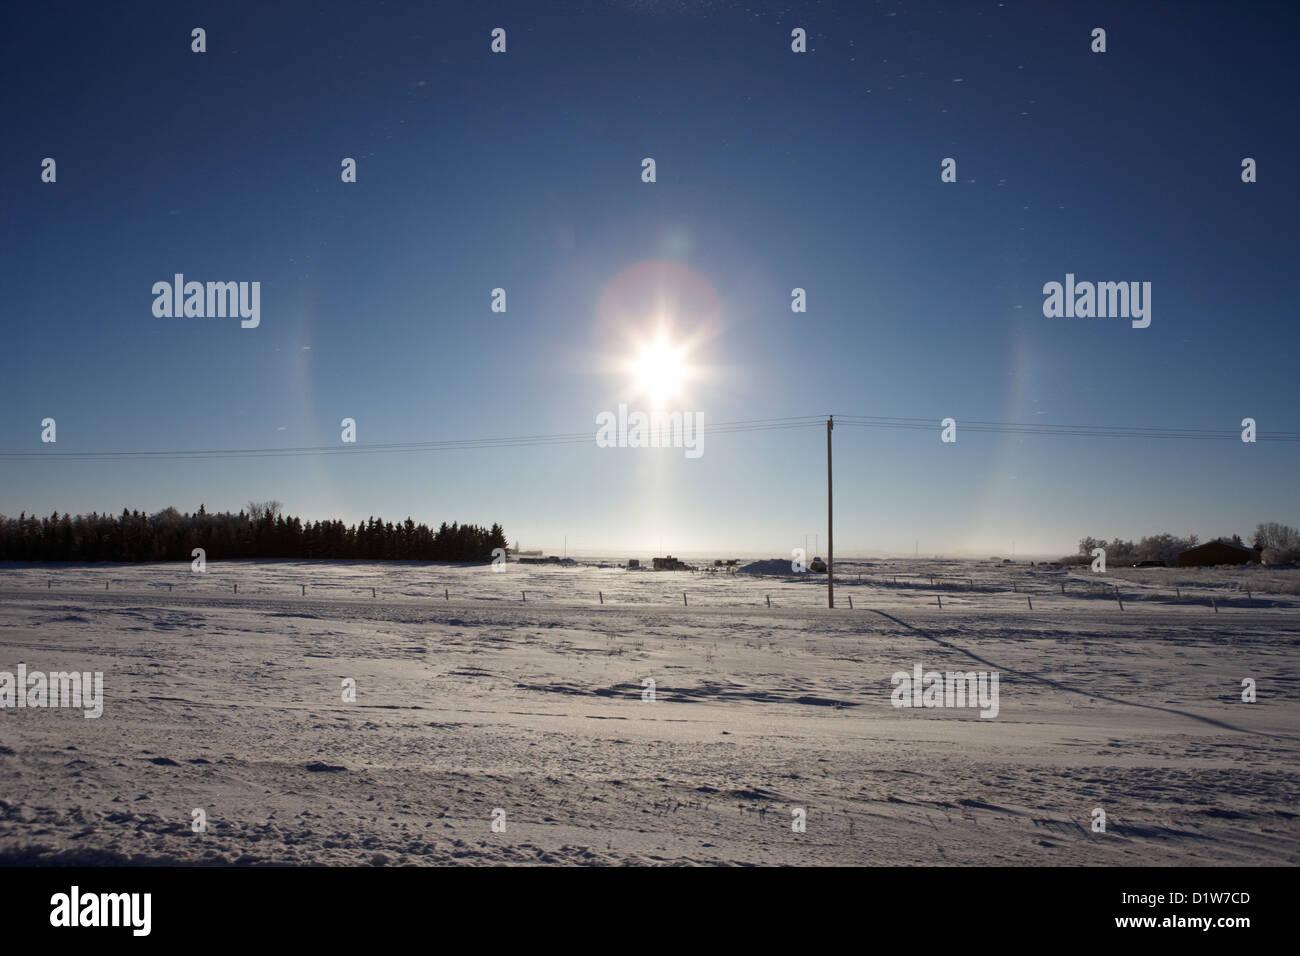 pair of sun dog parhelion halo due to ice crystals surrounding the sun in Saskatchewan Canada - Stock Image